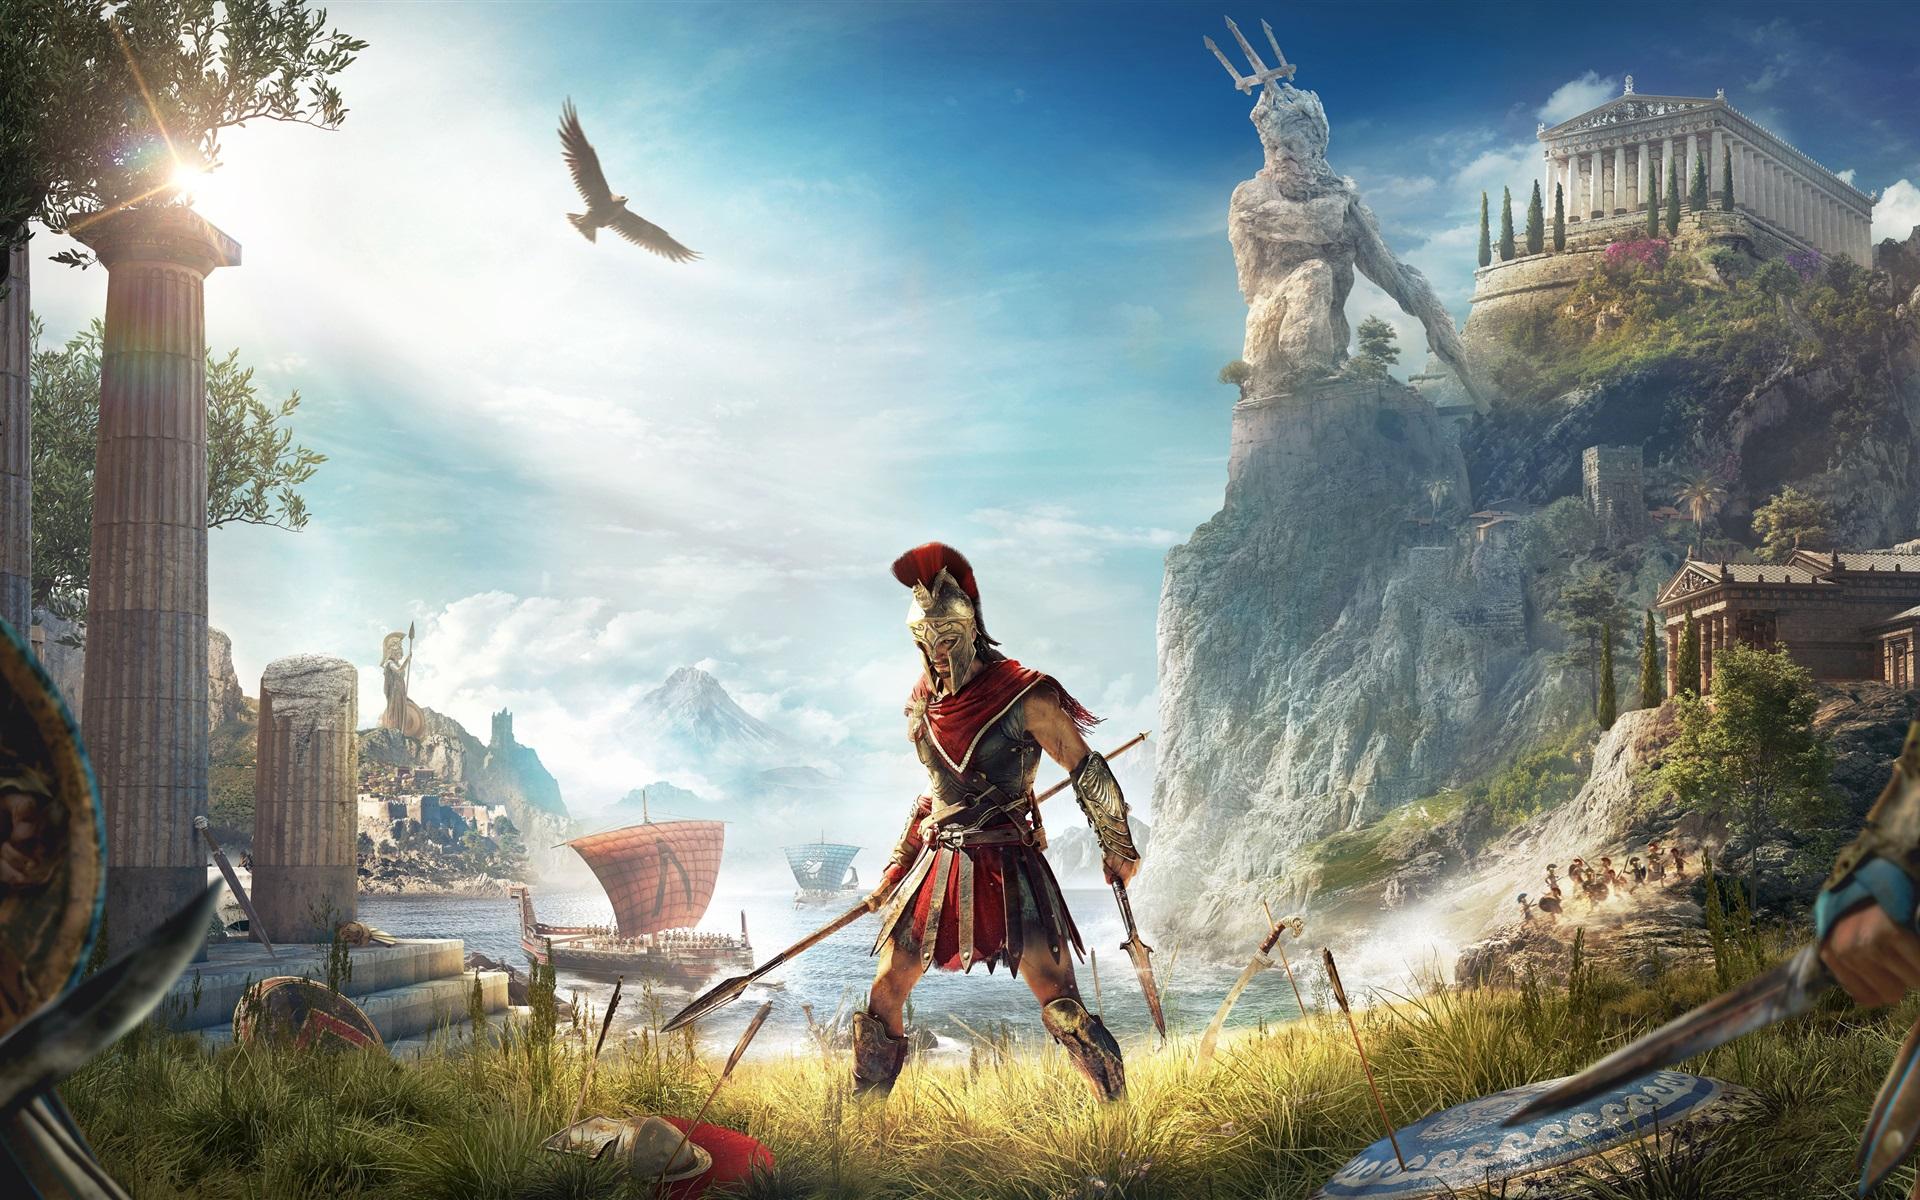 Snow Wallpaper Iphone 5 Wallpaper Assassin S Creed Odyssey E3 2018 3840x2160 Uhd